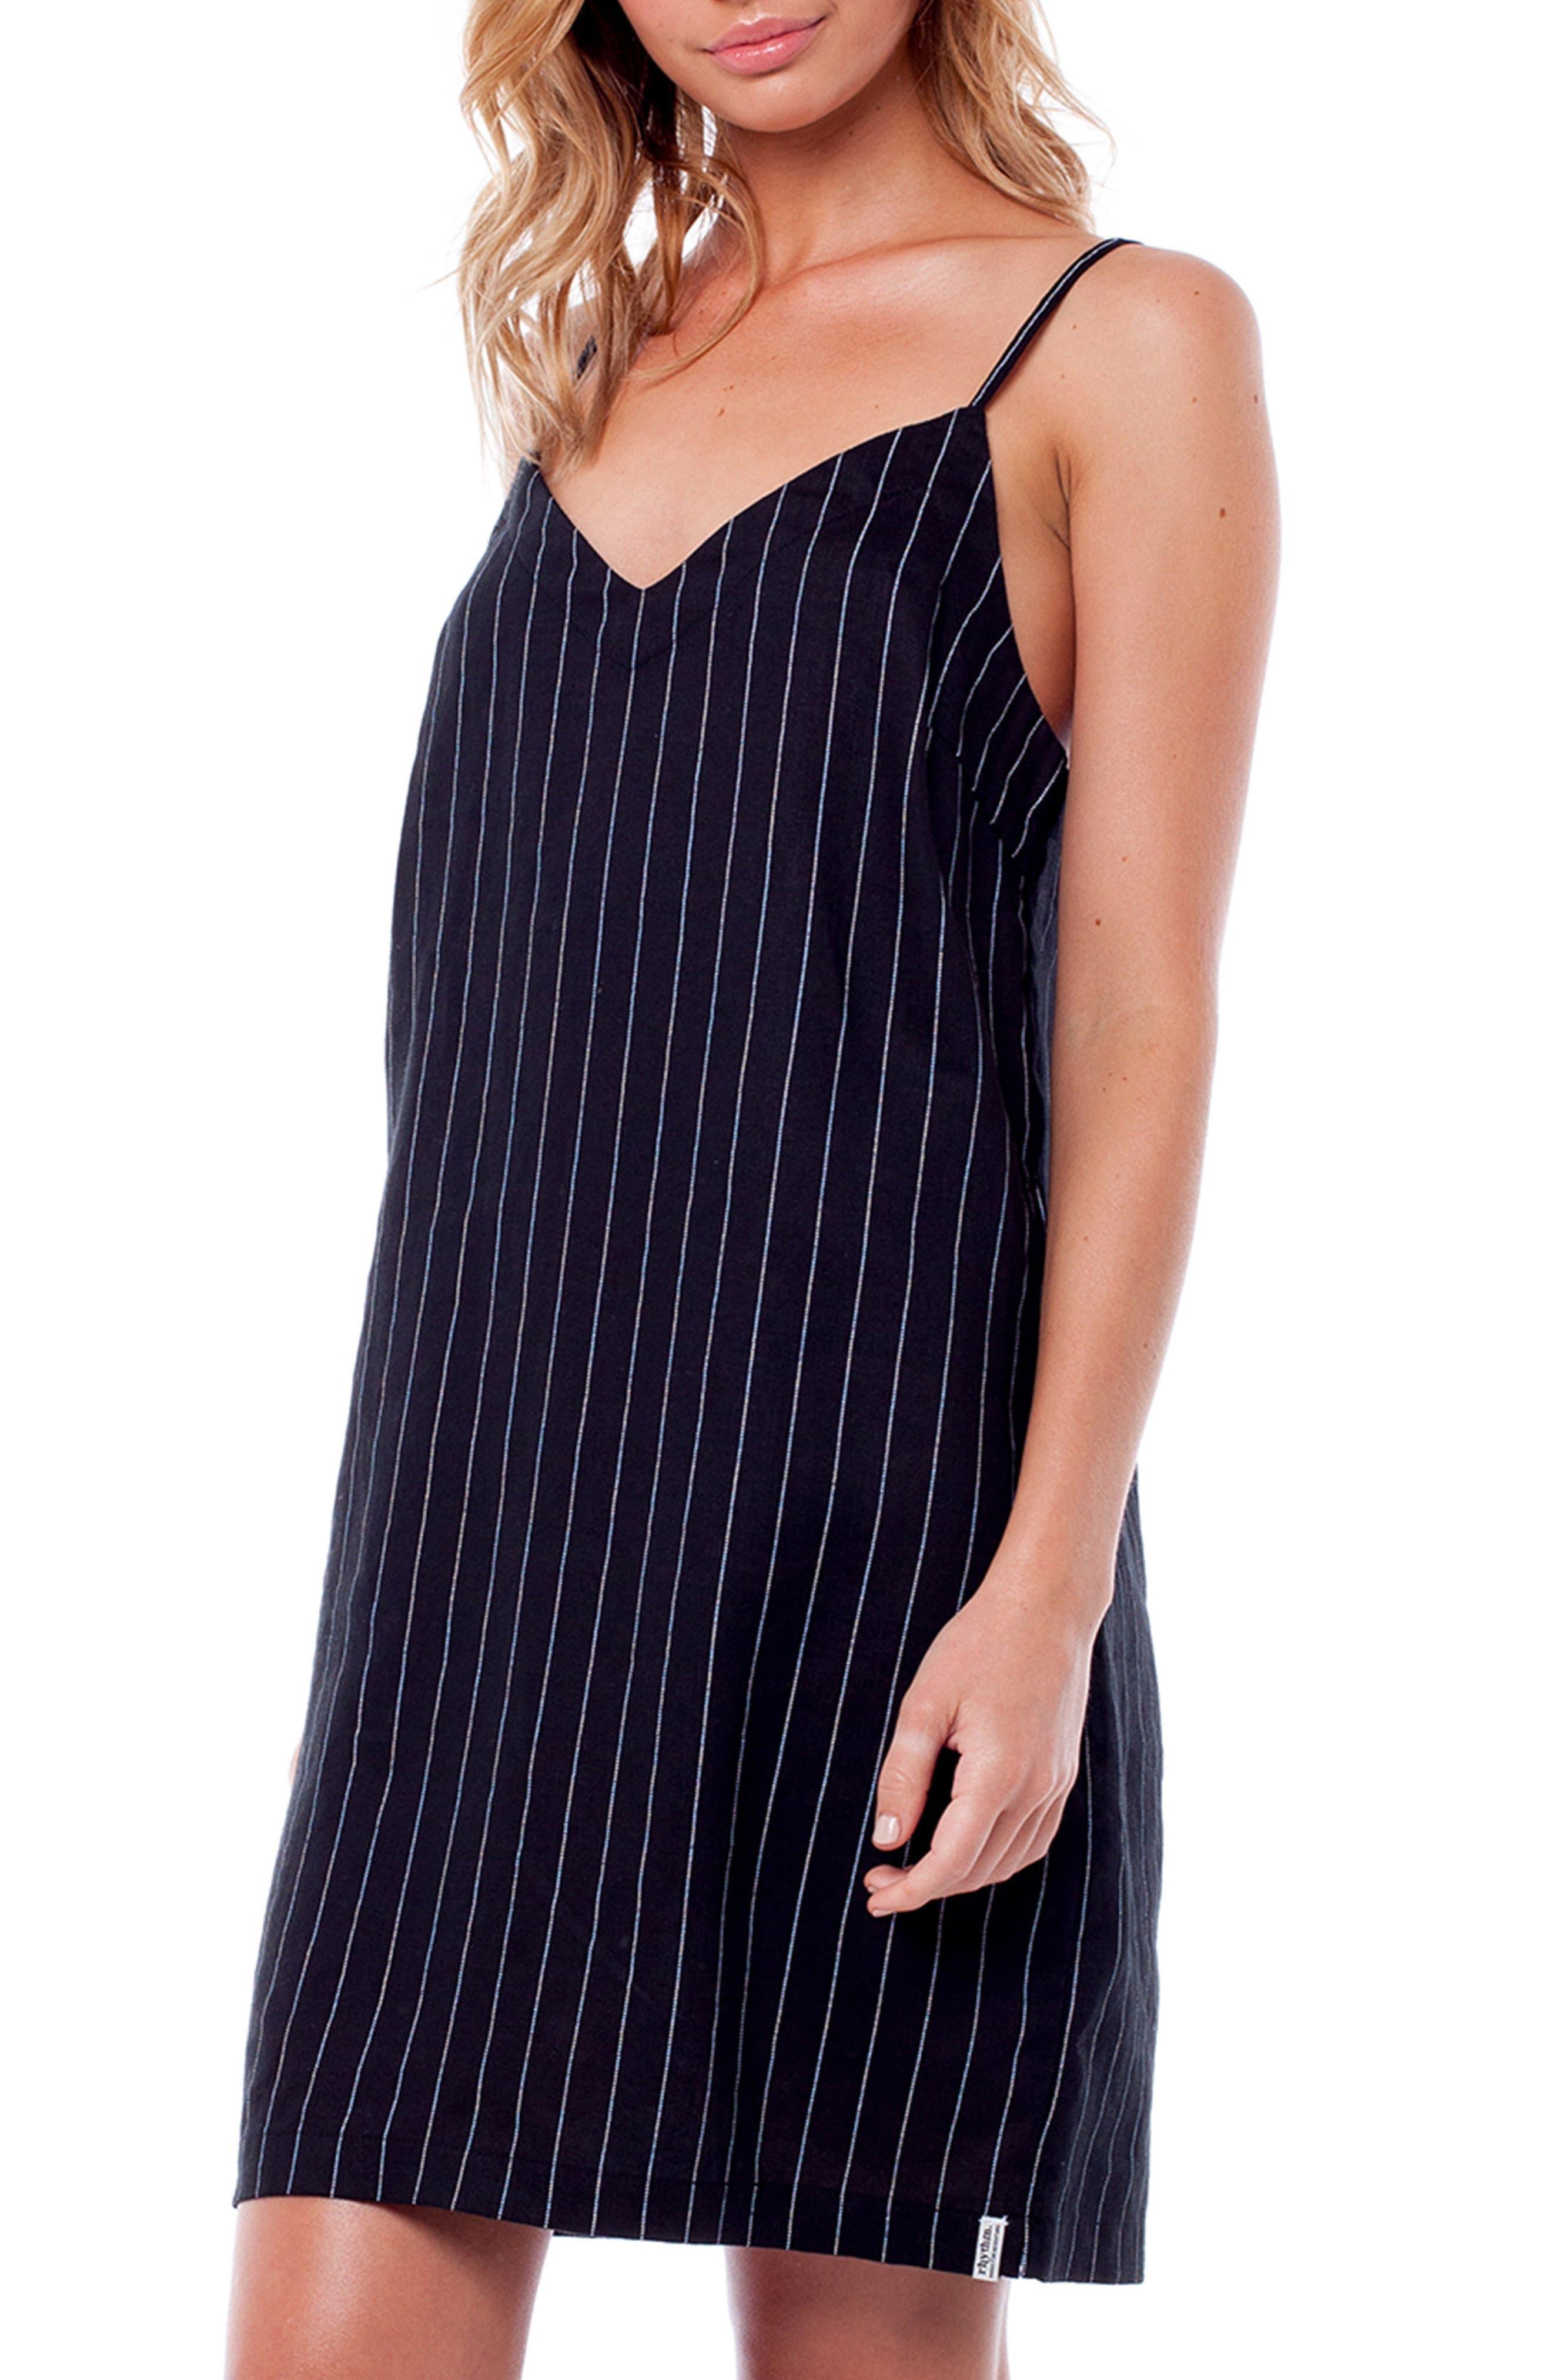 Catalina Cover-Up Dress,                             Alternate thumbnail 3, color,                             BLACK